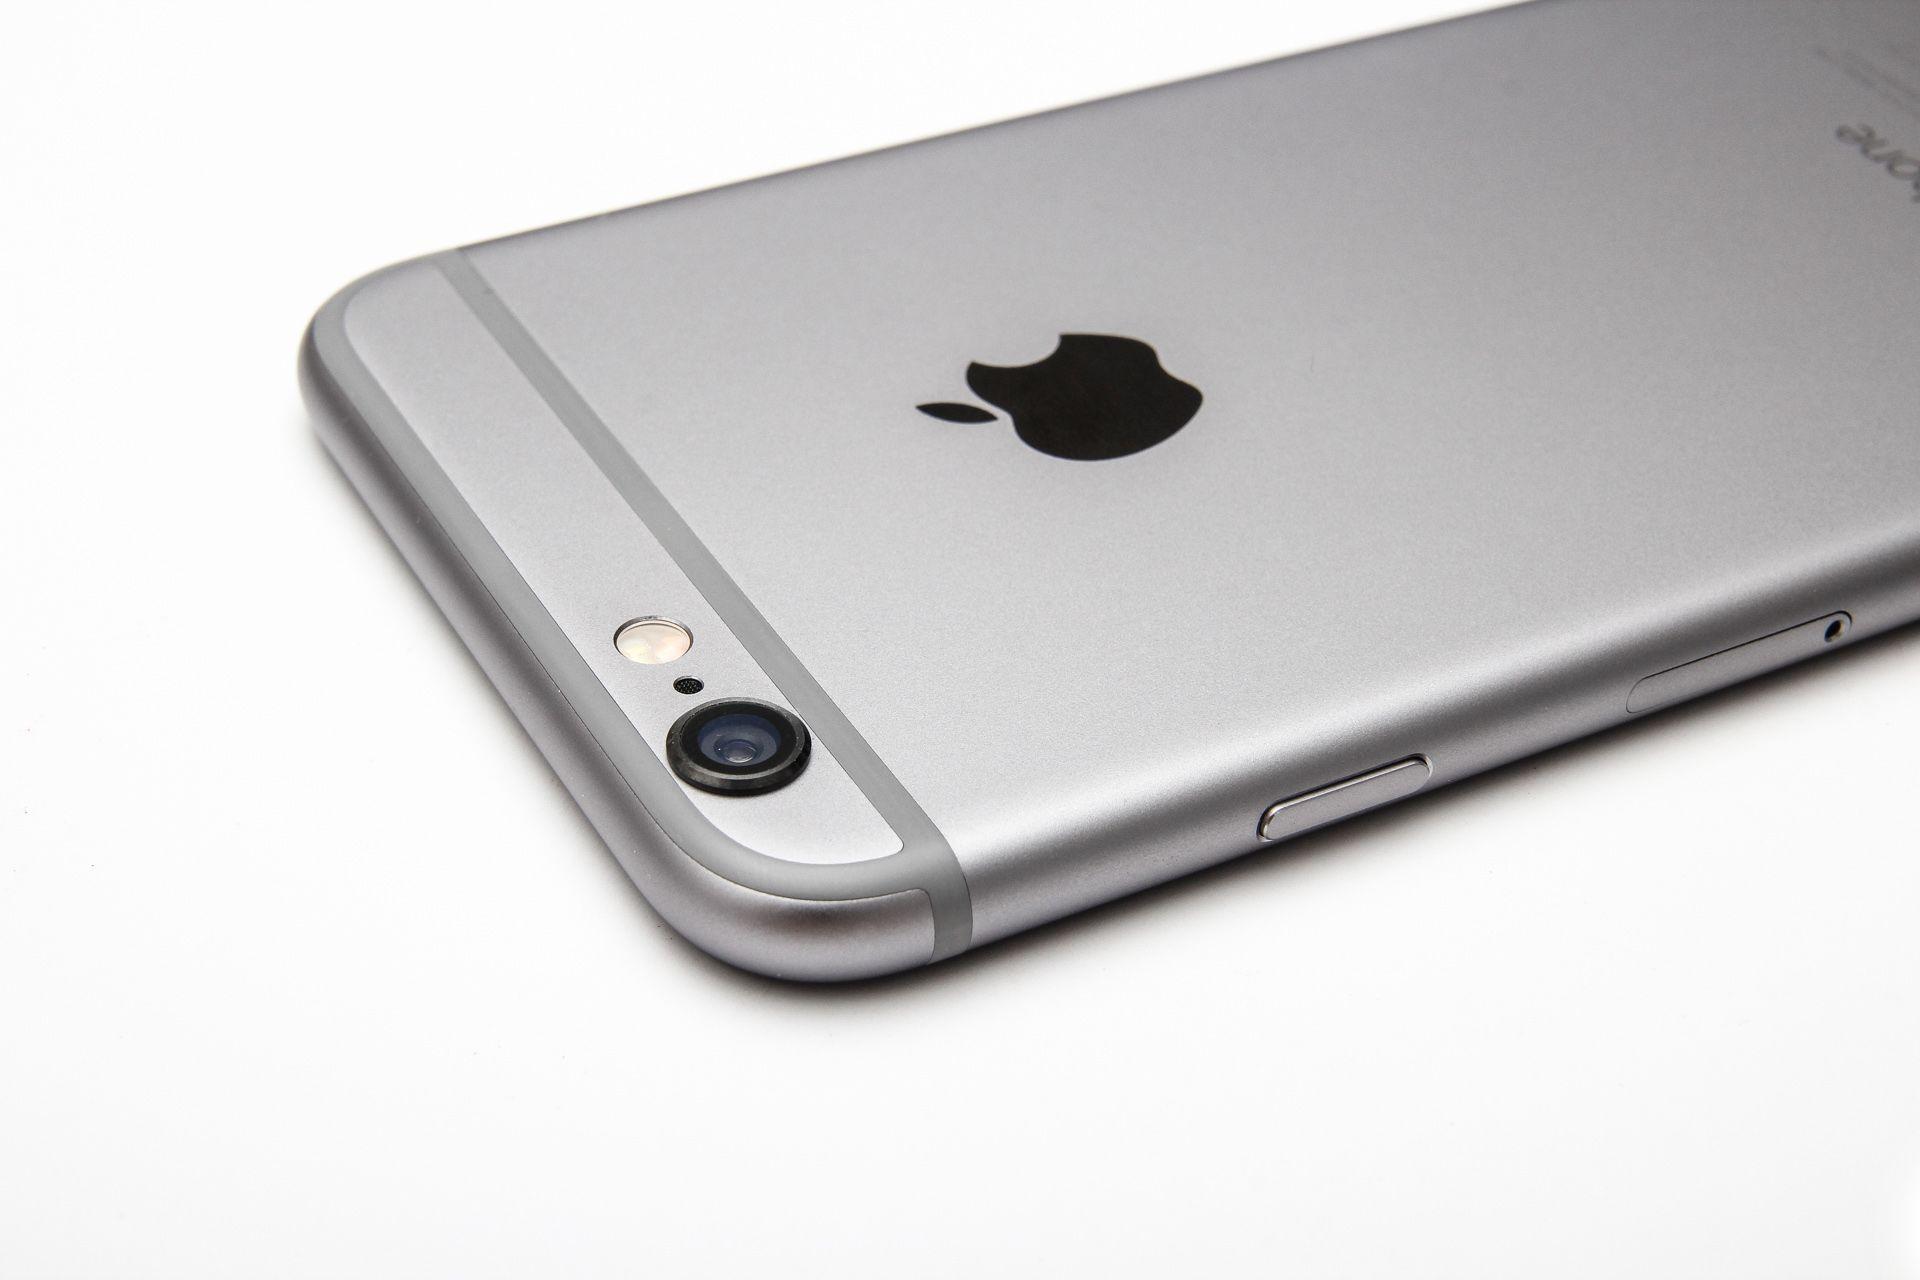 iPhone 6 e iPhone 6 Plus sensibili ai graffi, utenti si lamentano